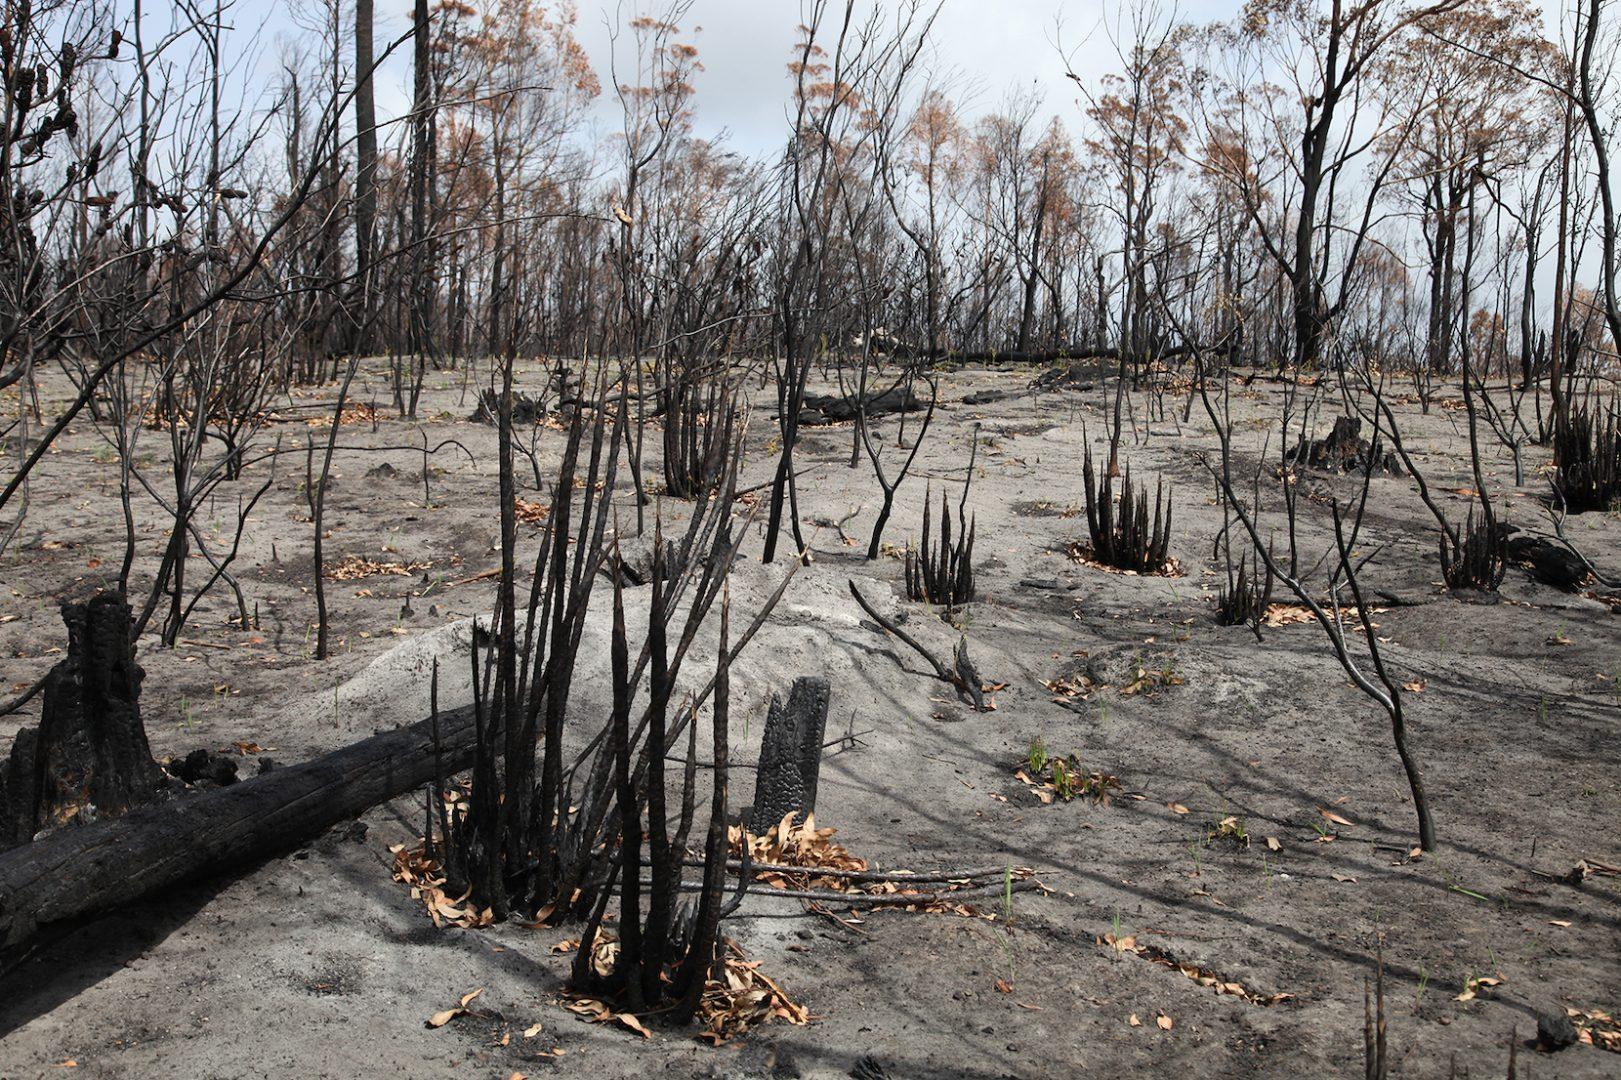 Artist and activist HAYDEN FOWLER on the Australian bushfires 8